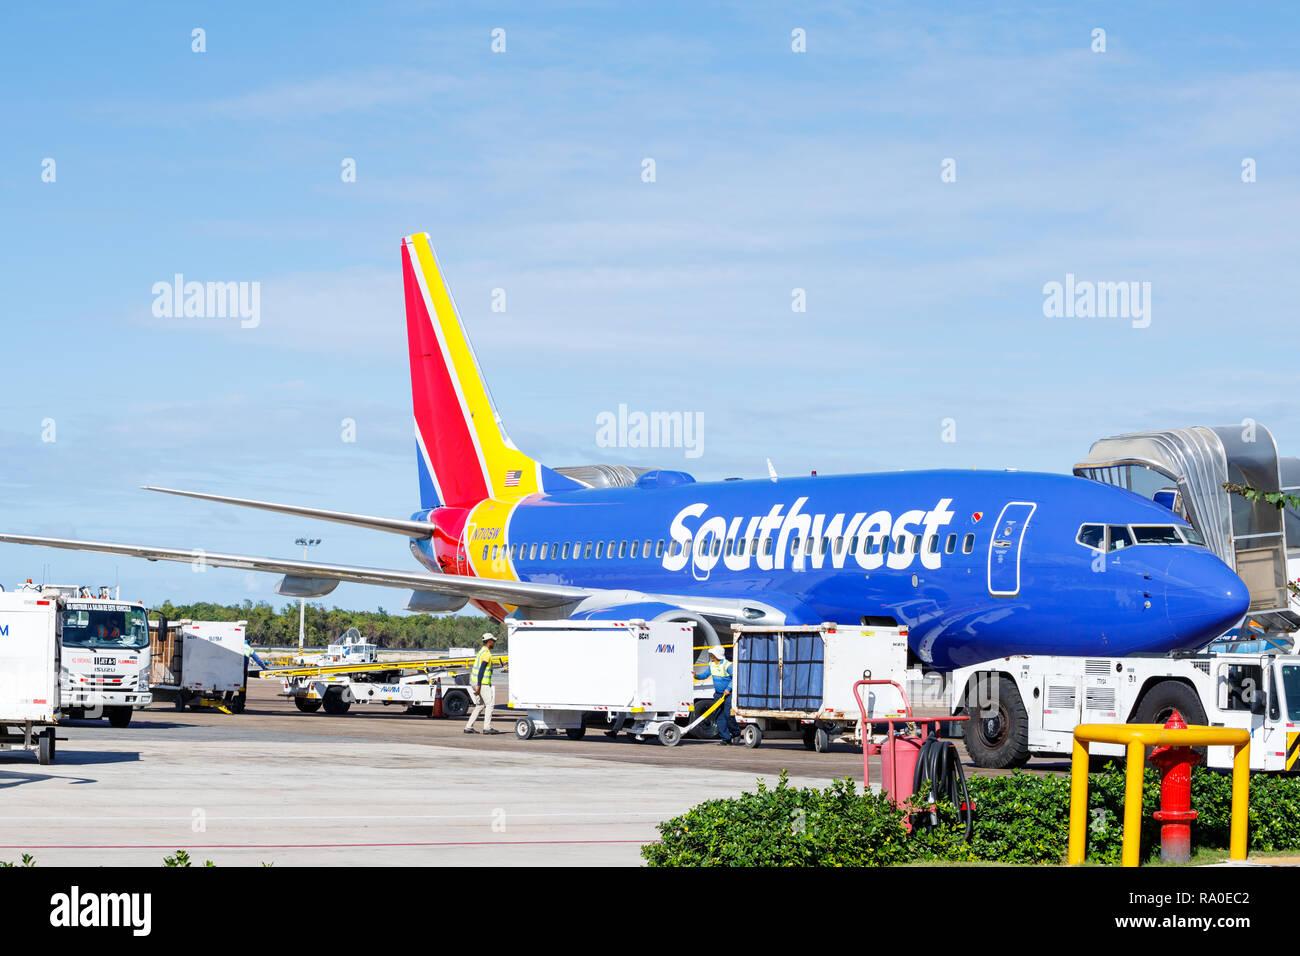 Punta Cana, República Dominicana - Diciembre 24, 2018: un avión de pasajeros de Southwest en el Aeropuerto Internacional de Punta Cana en asfalto en espera de carga Imagen De Stock